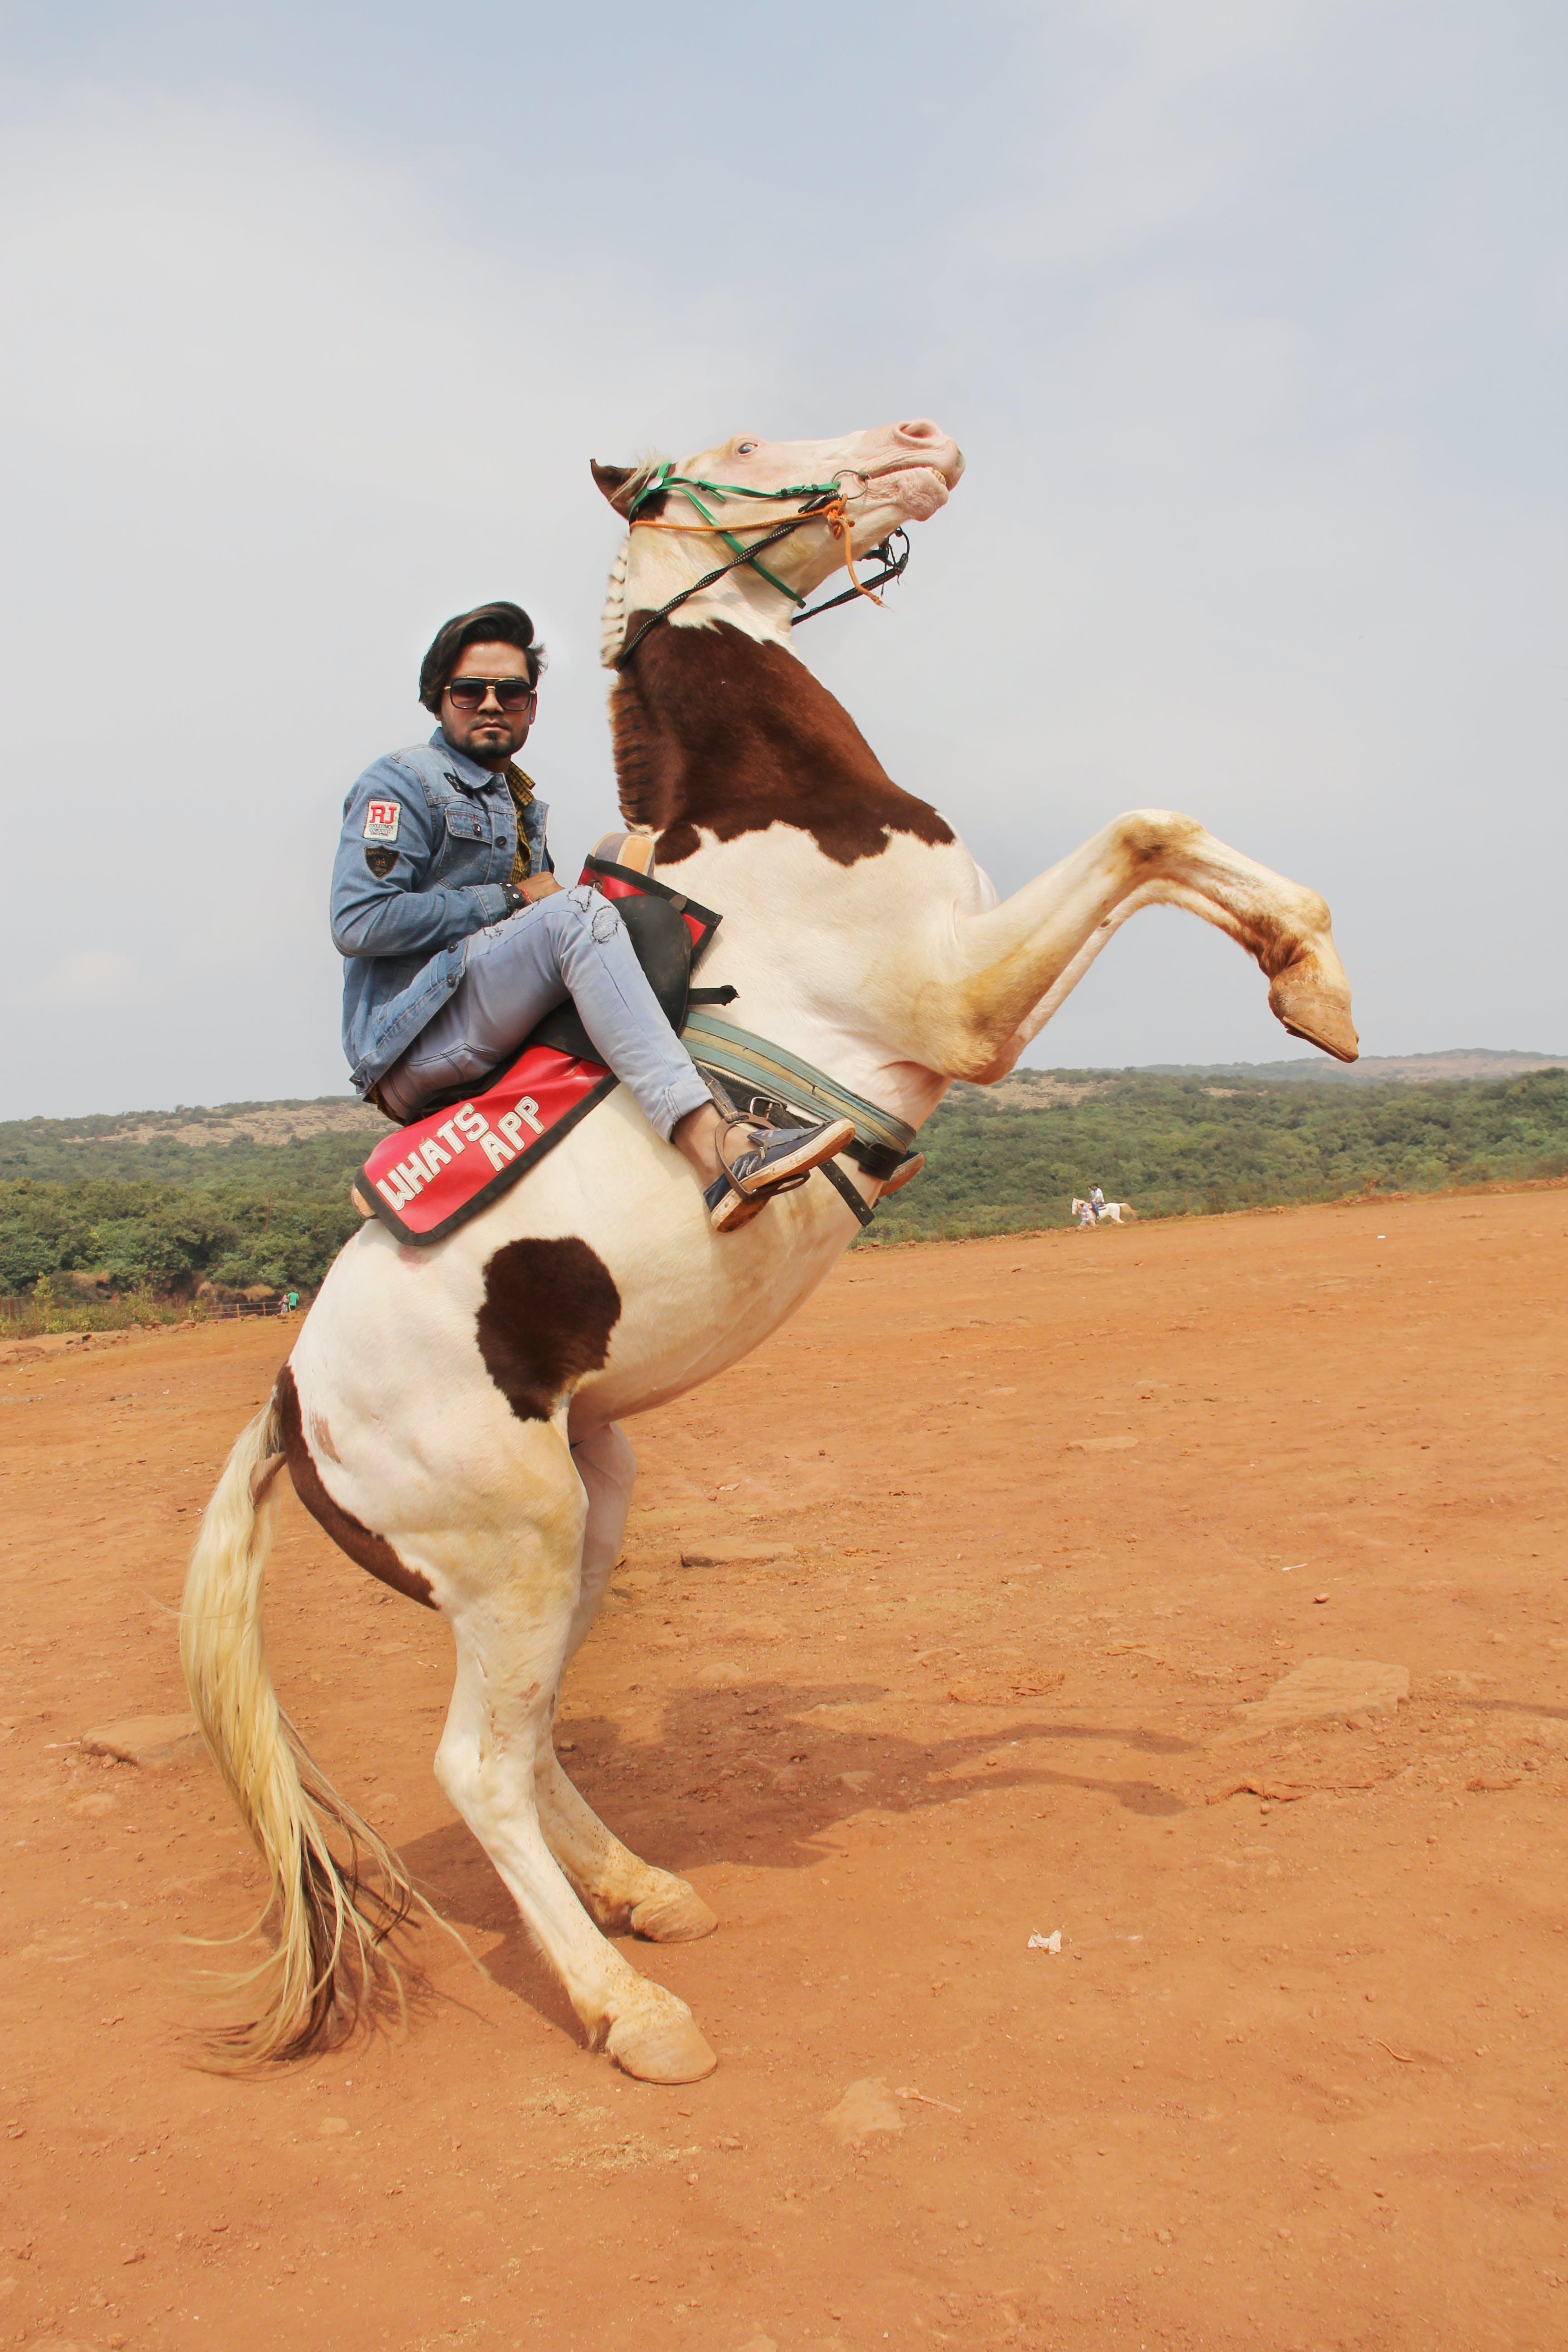 Free stock photo of horse rider